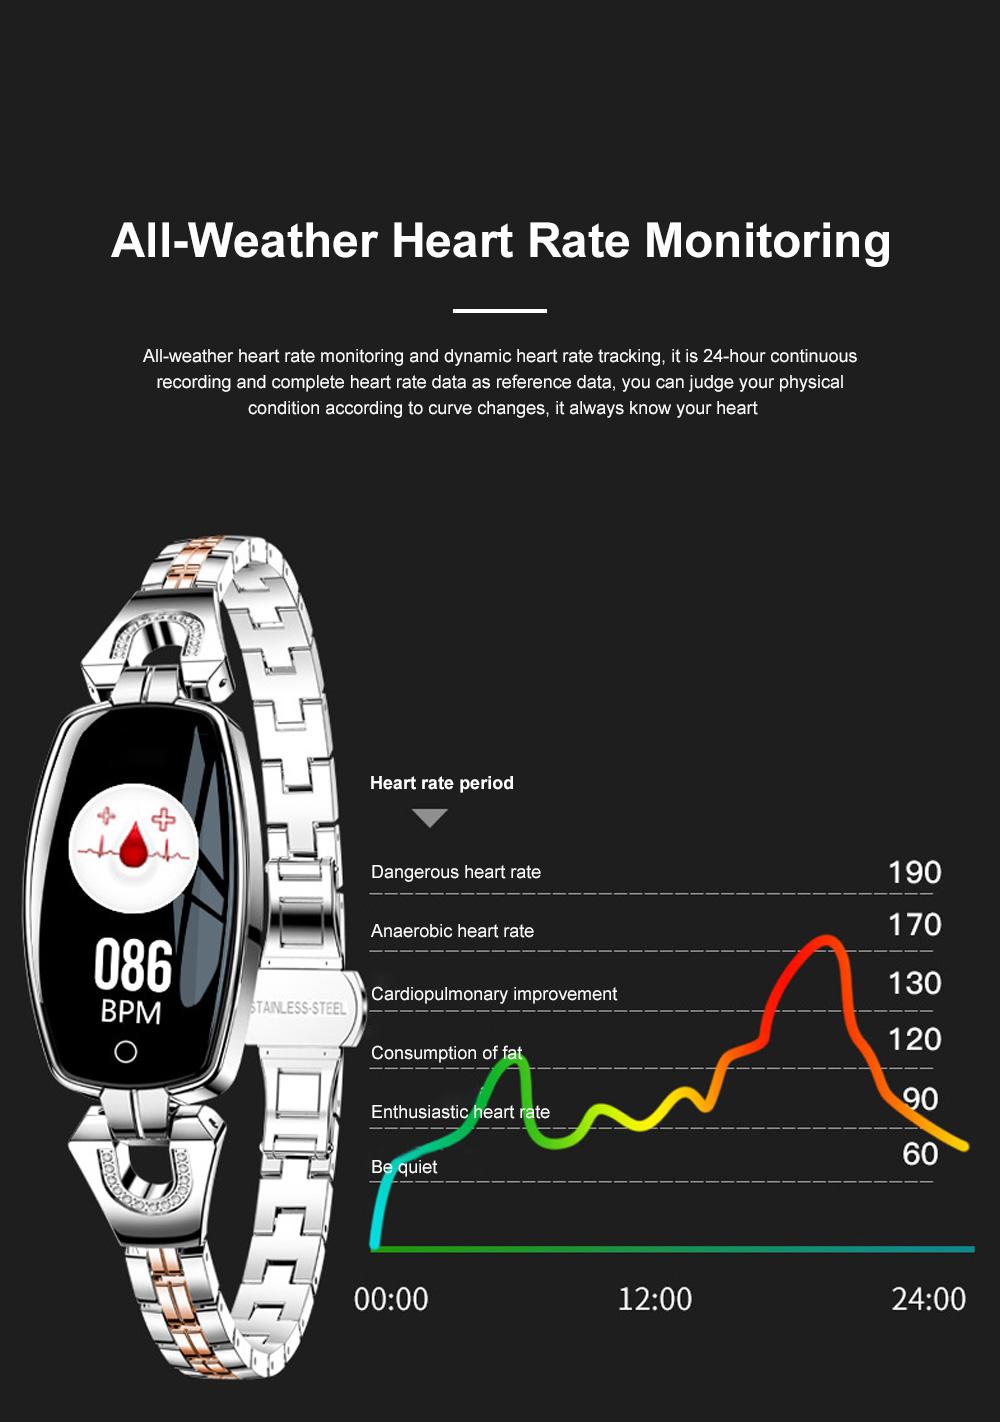 2019 Women Lady Fashion Smart Wristband H8 Heart Rate Blood Pressure Smart Bracelet Fitness Tracker Smart Watch Band Female Girl Gift 2